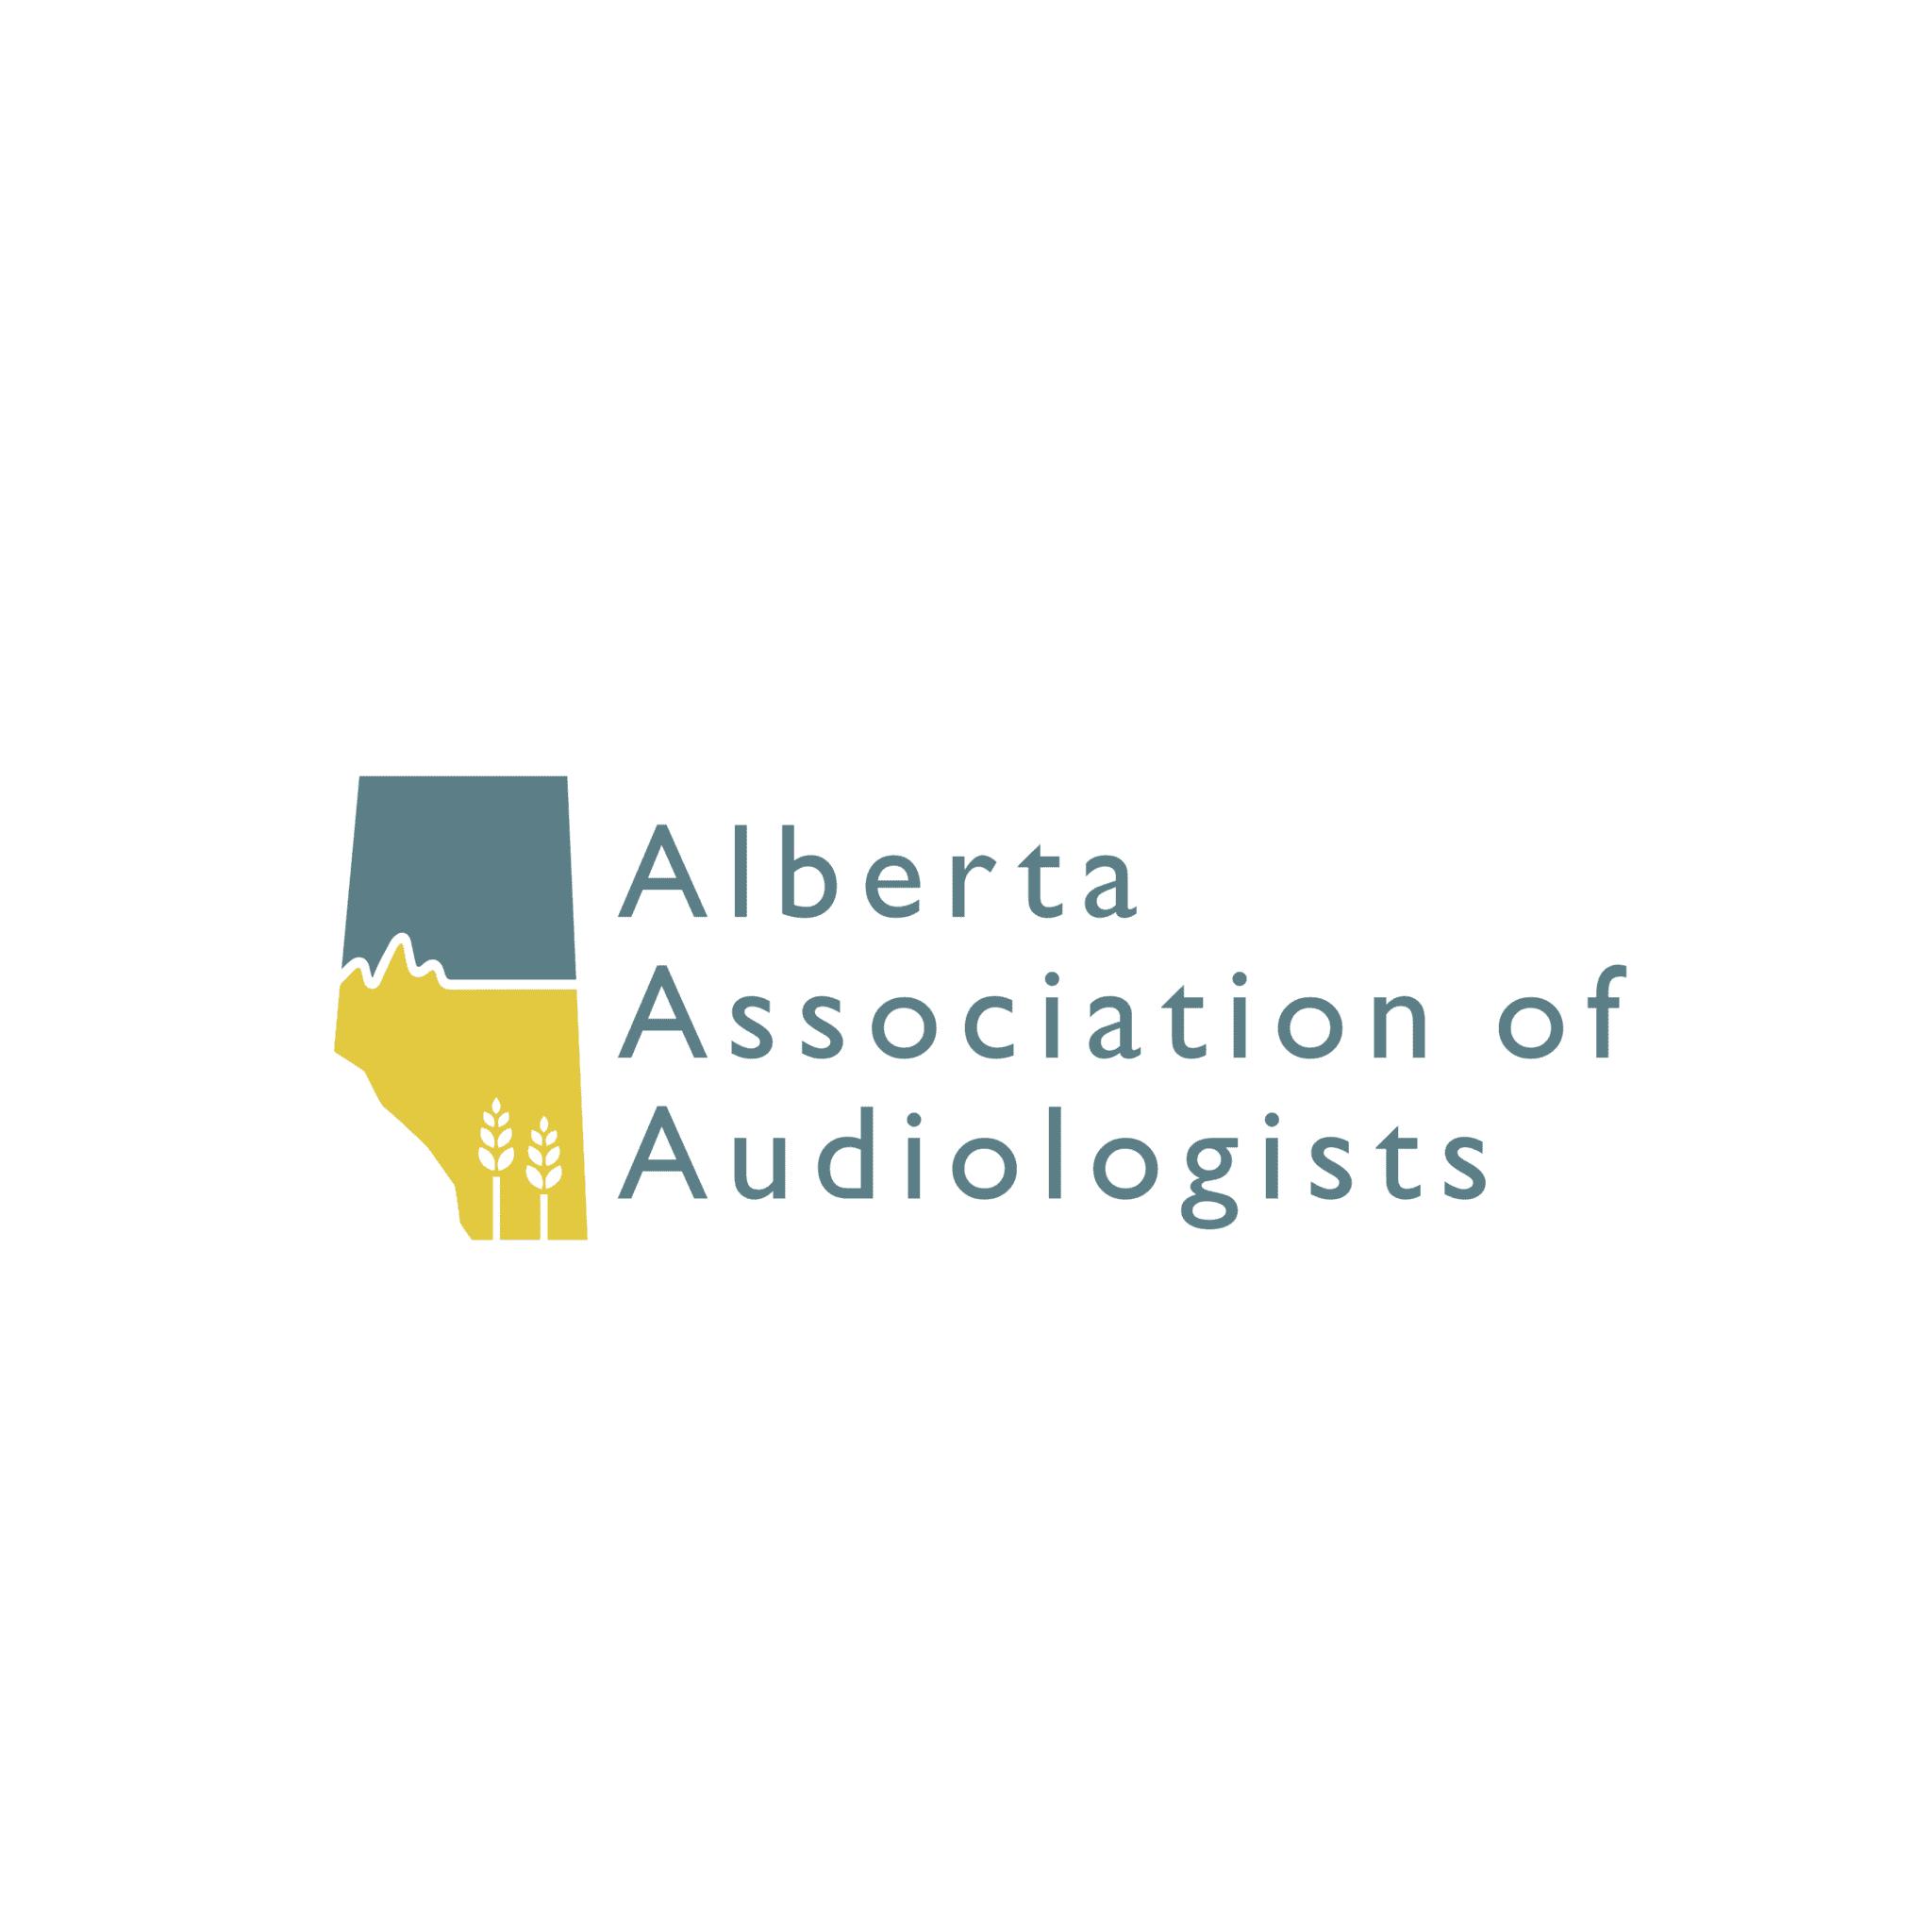 Alberta Association of Audiologists Logo Design